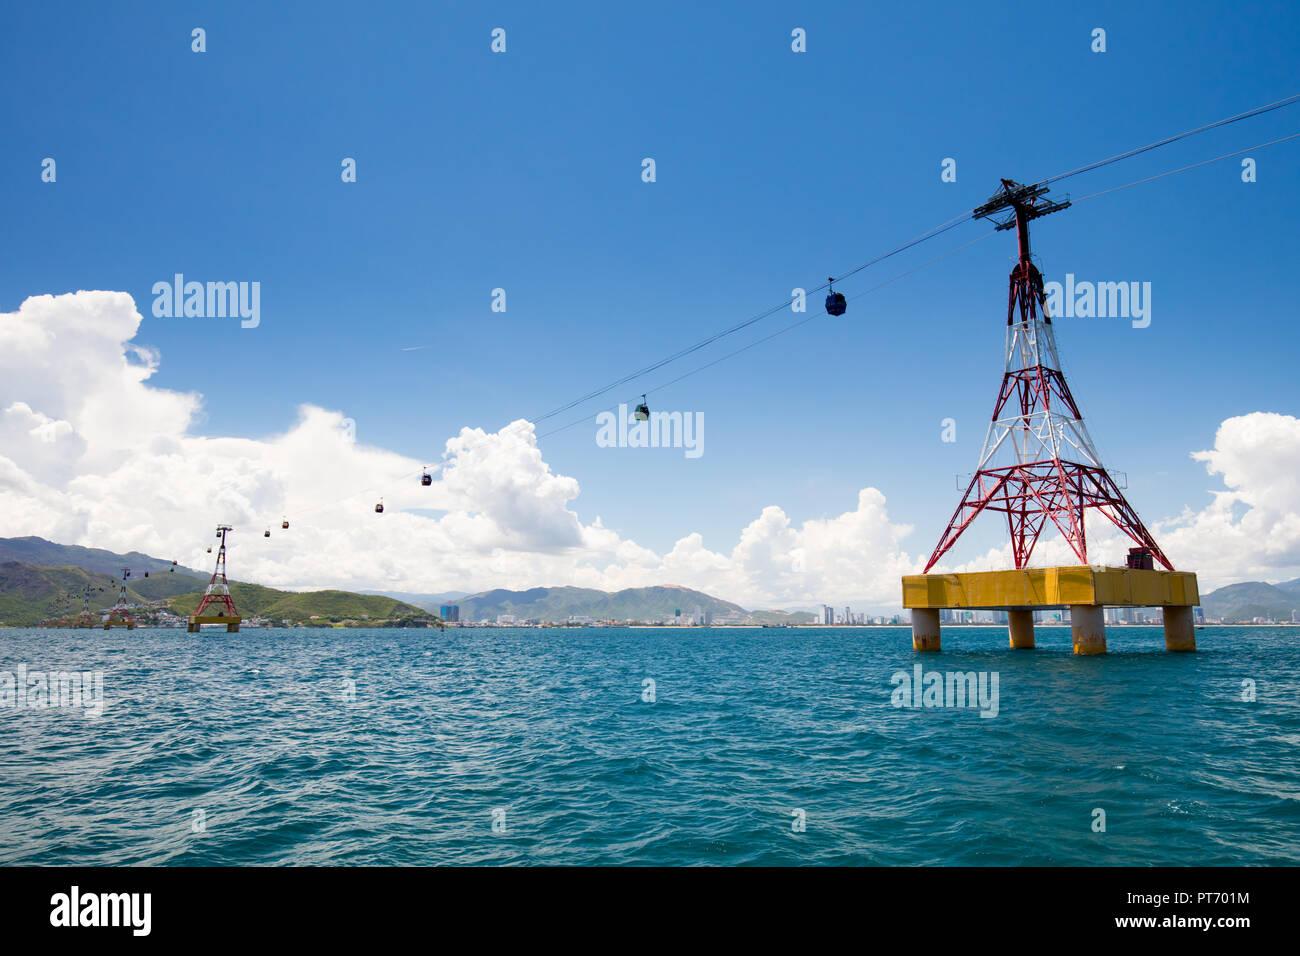 Nha Trang Vietnam Skyline - Stock Image